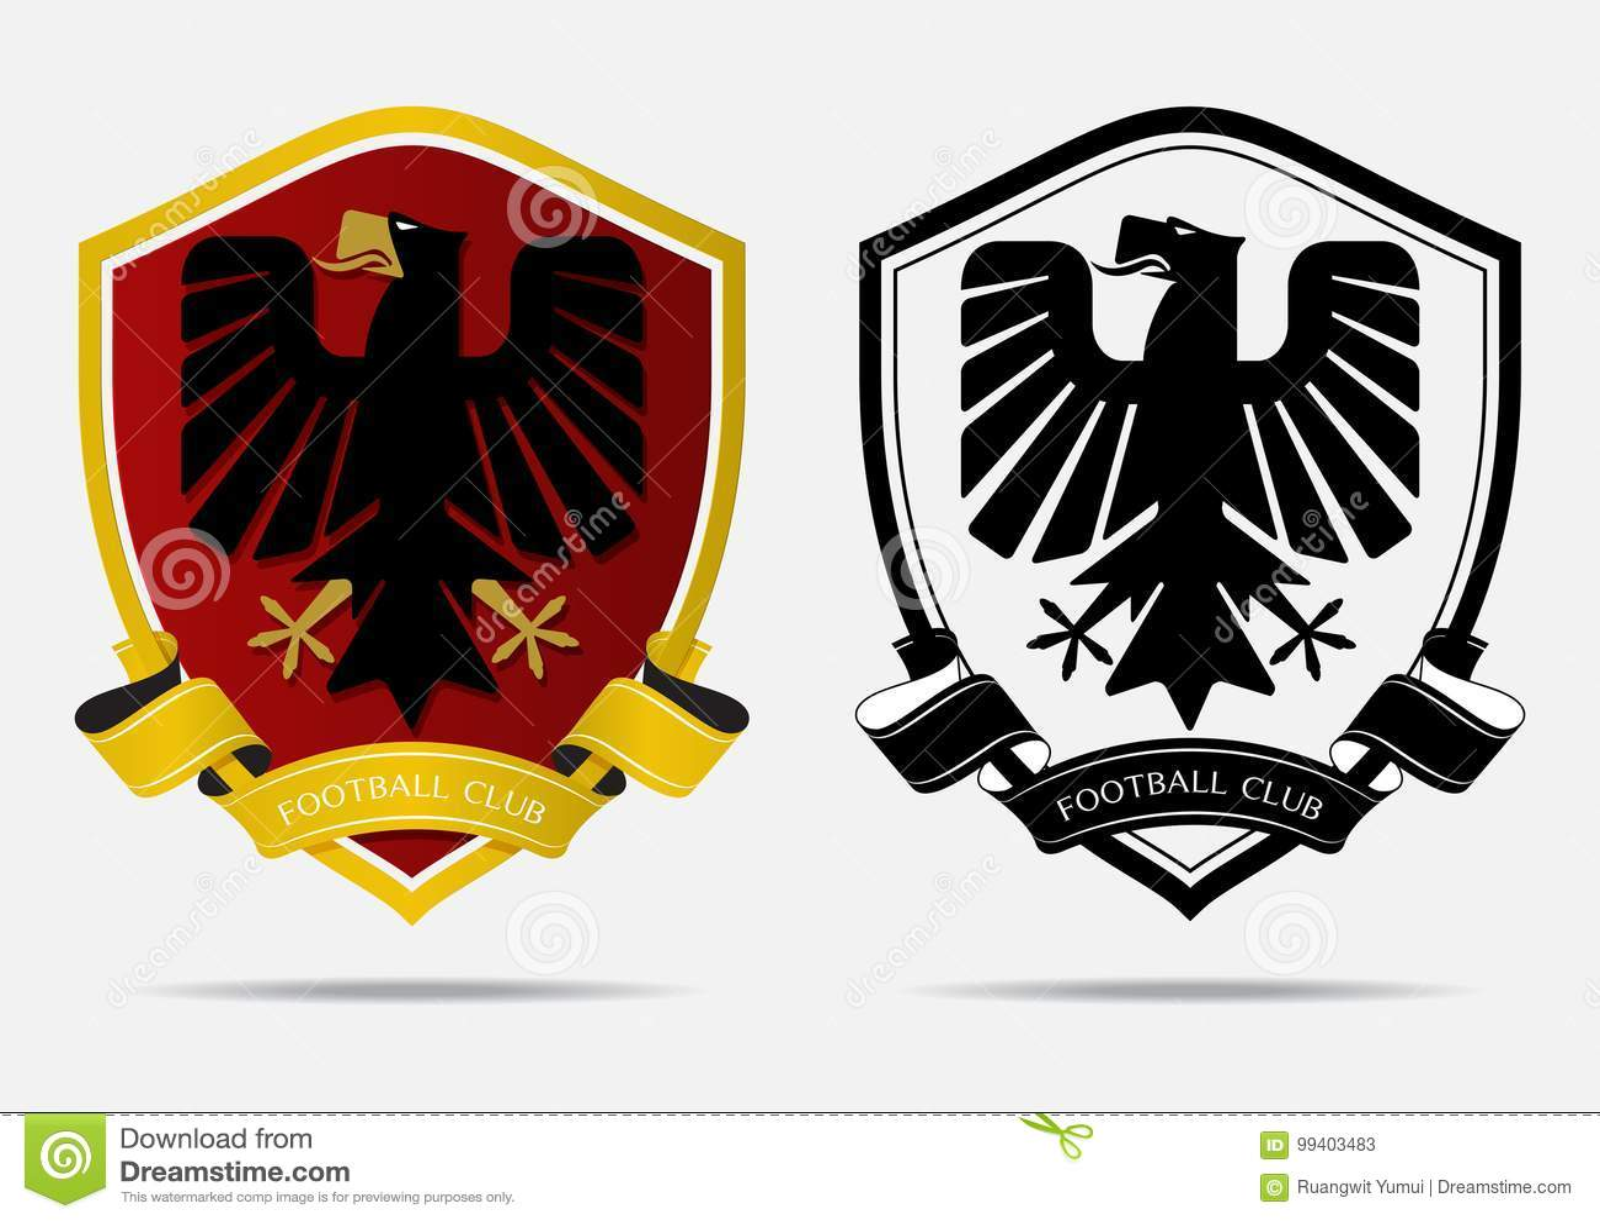 soccer football badge logo design template sport team identity